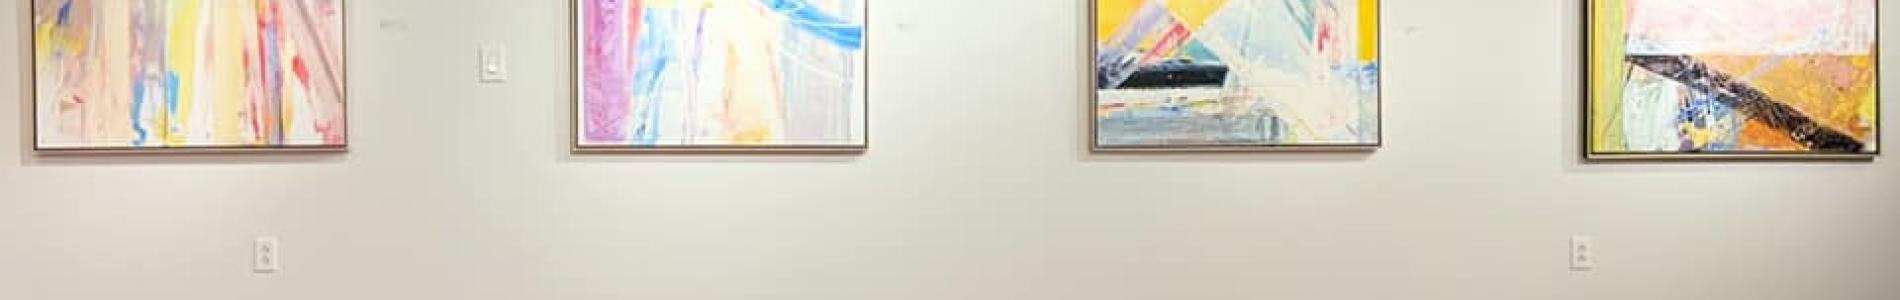 University Place Gallery